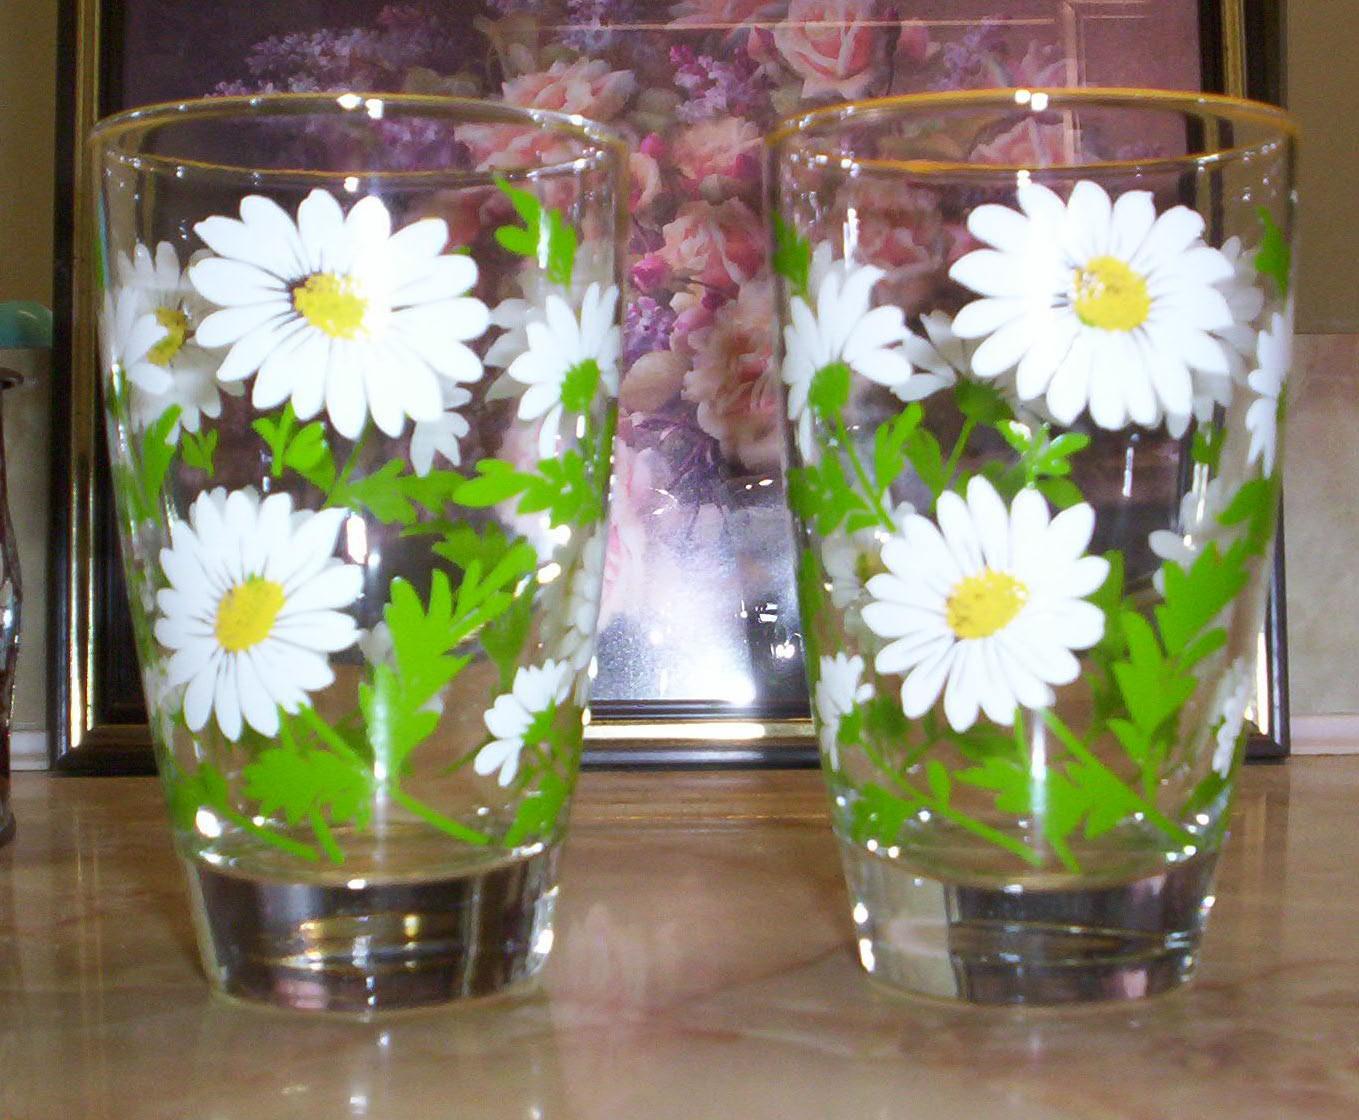 daisy drinking glasses - il_fullxfull.169327669